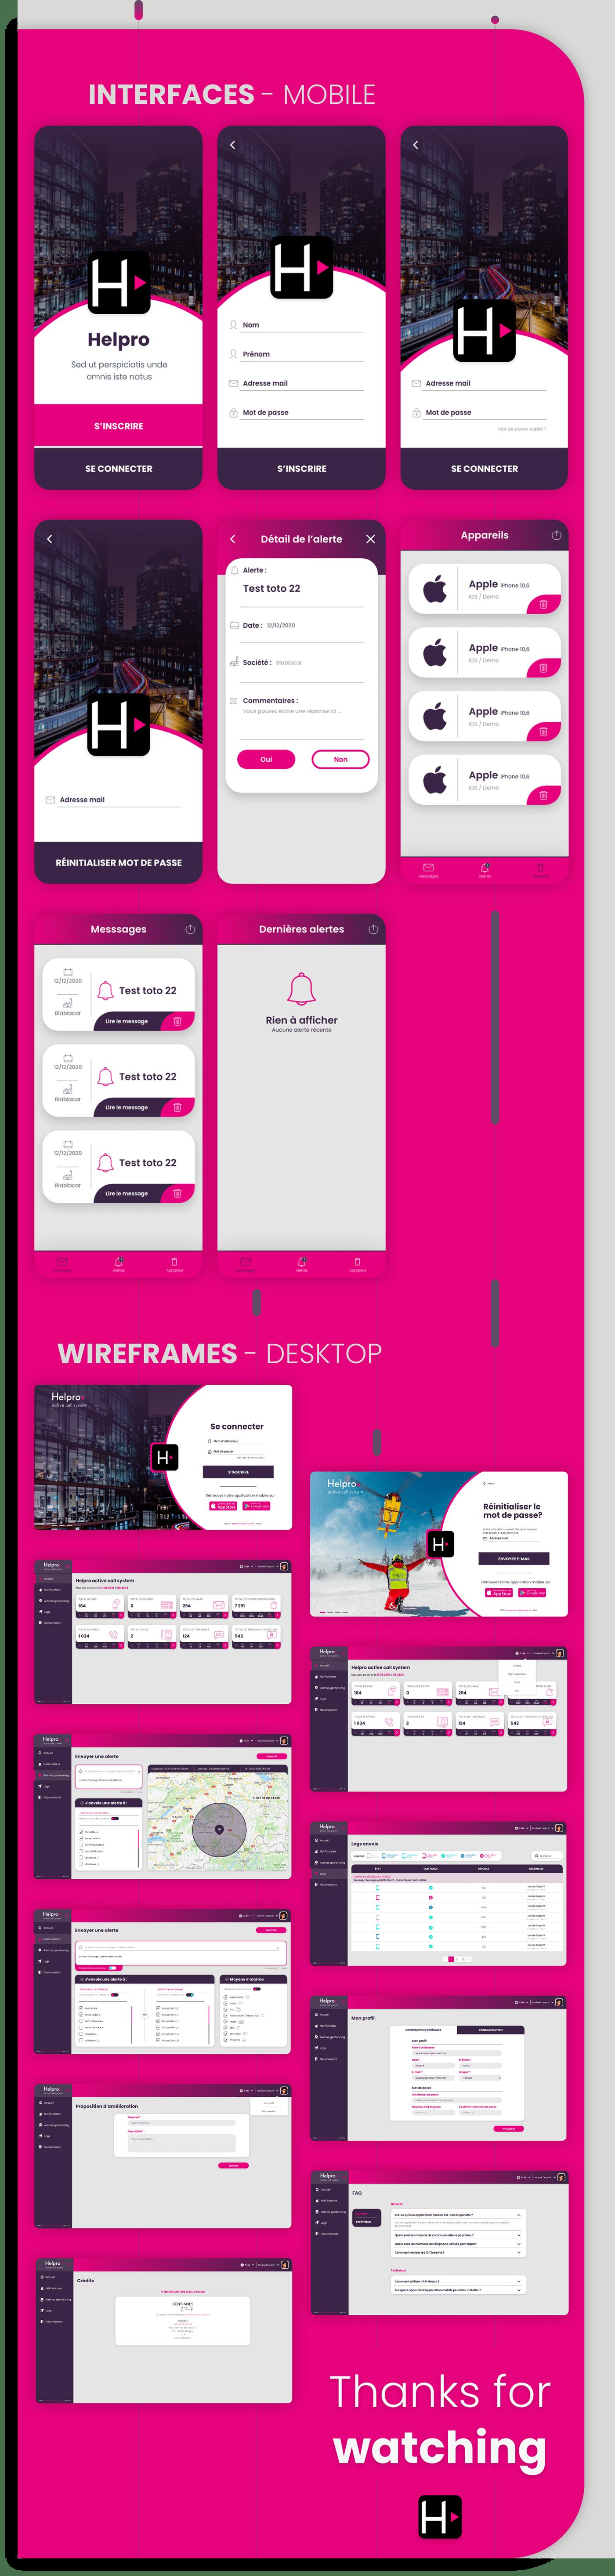 design help helpro interfaces redesign UI/UX Design wireframes